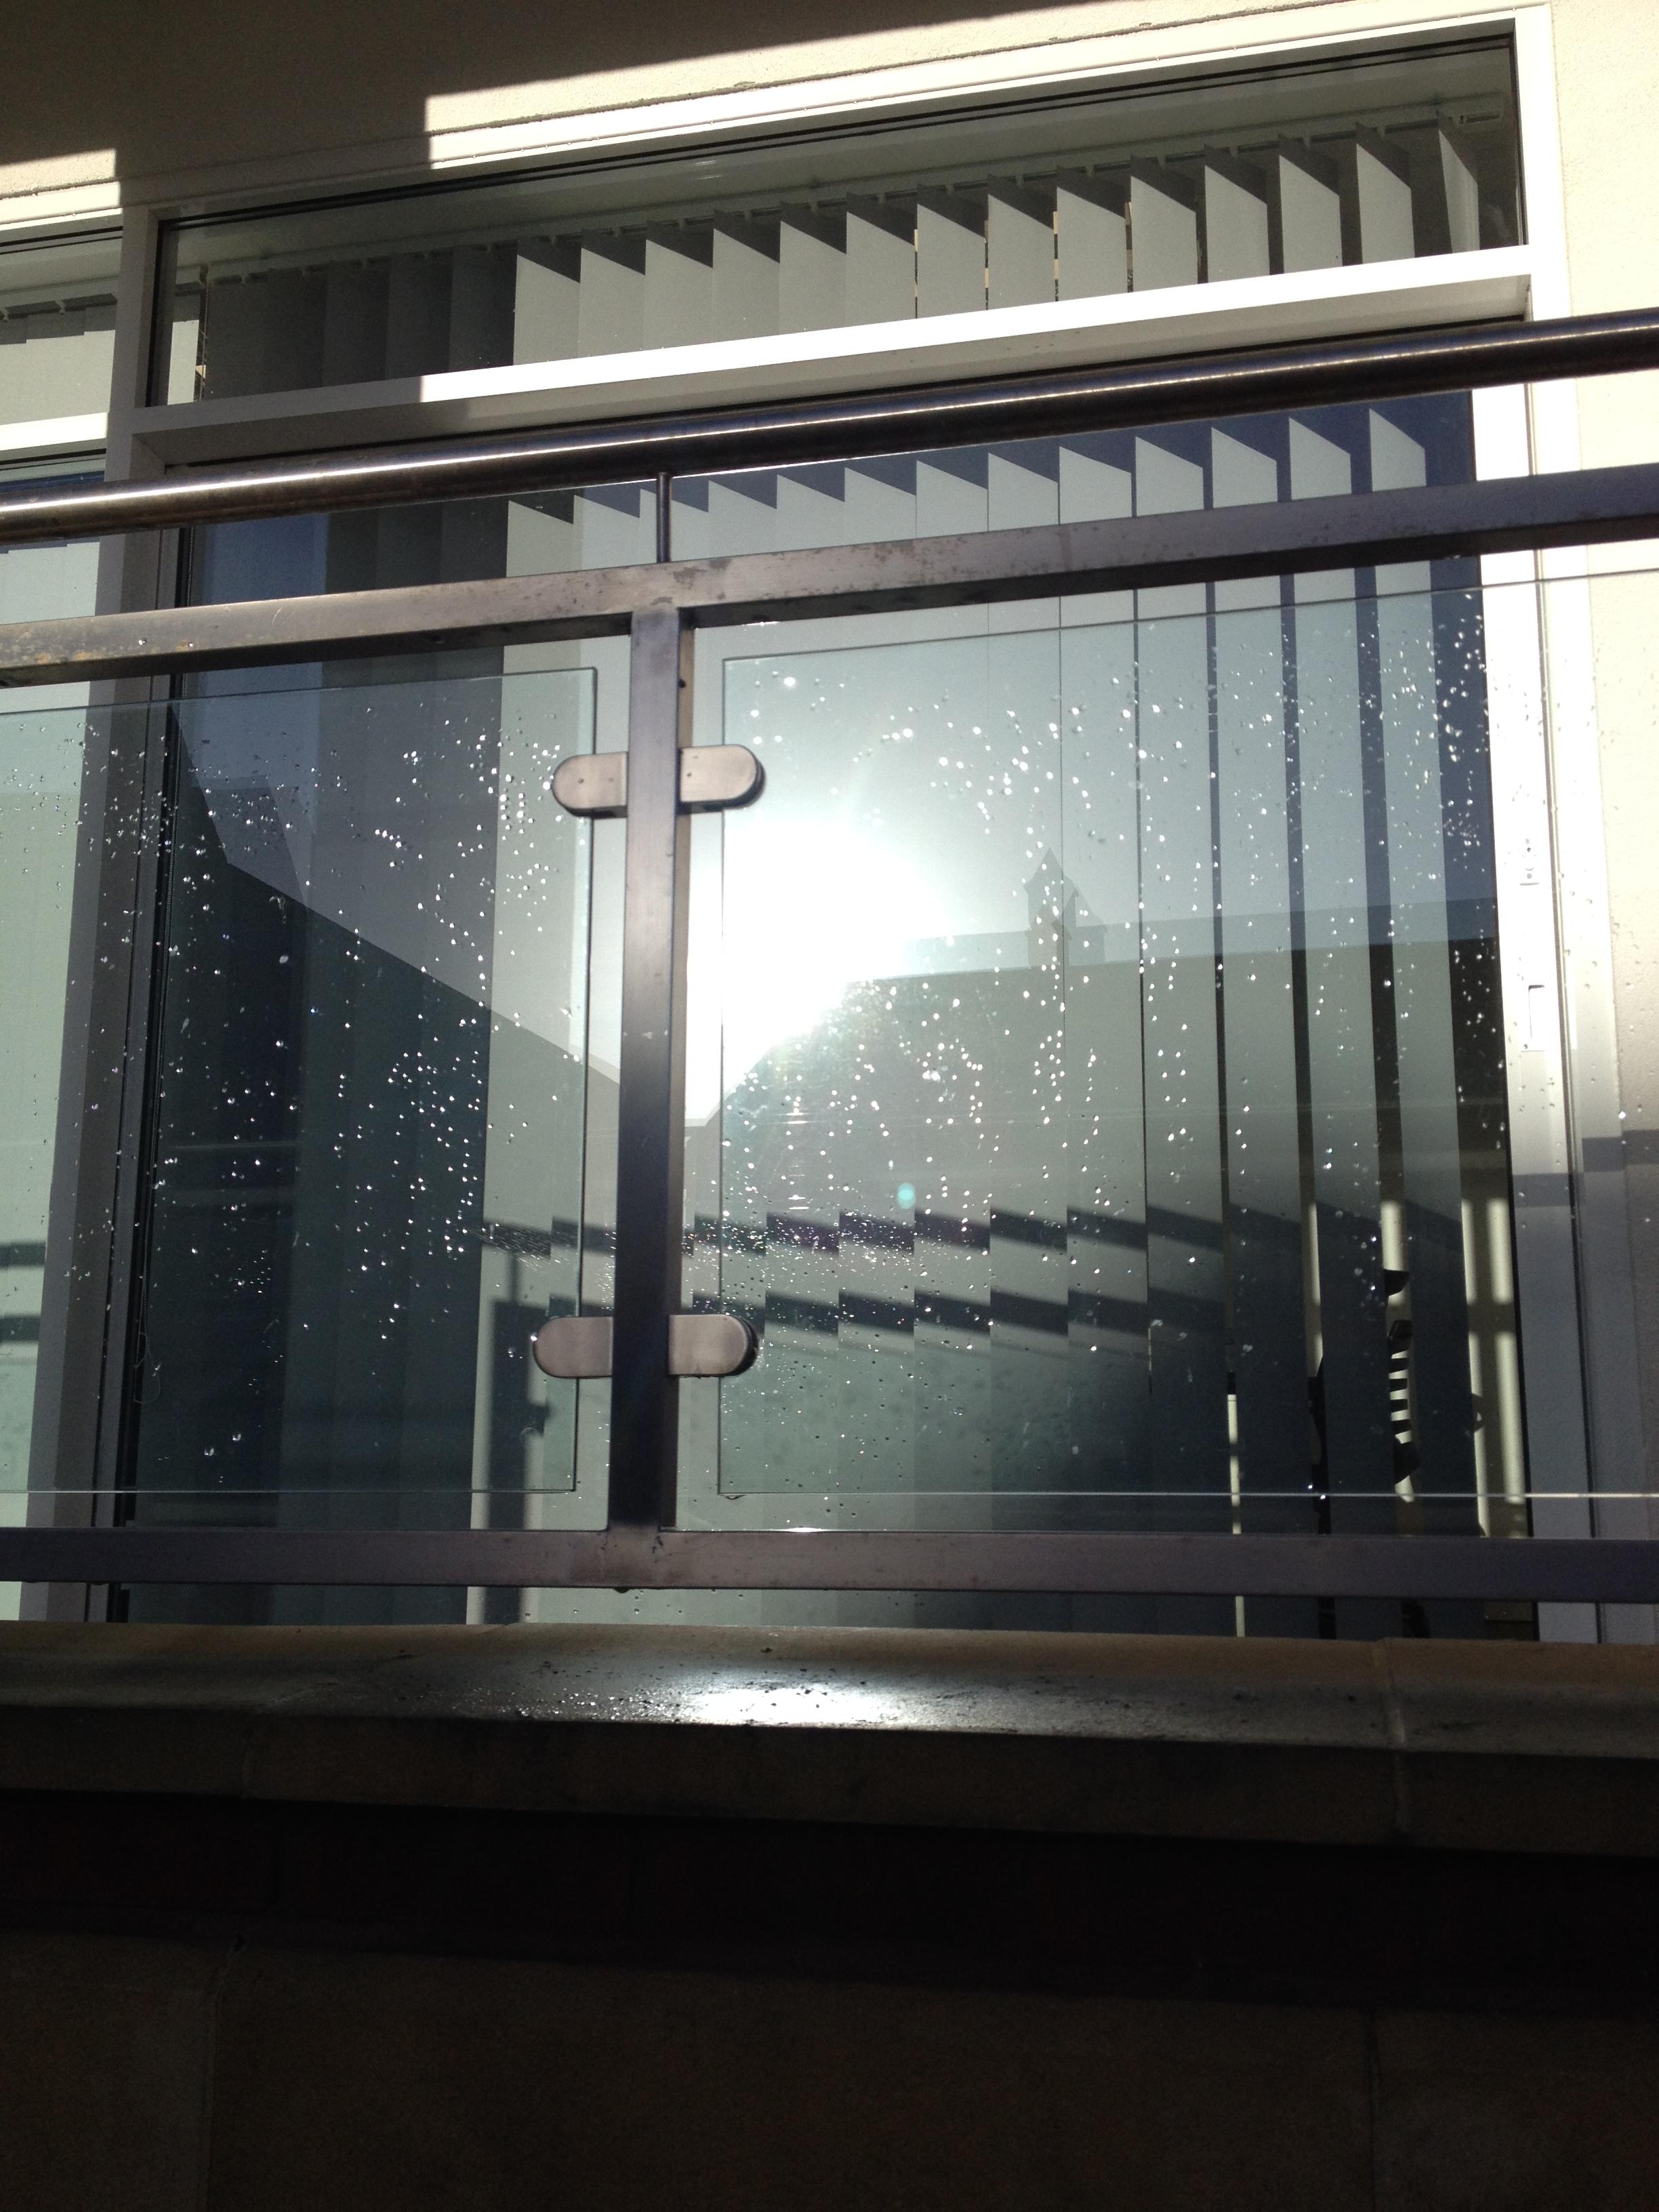 Window Cleaner In Shrewsbury